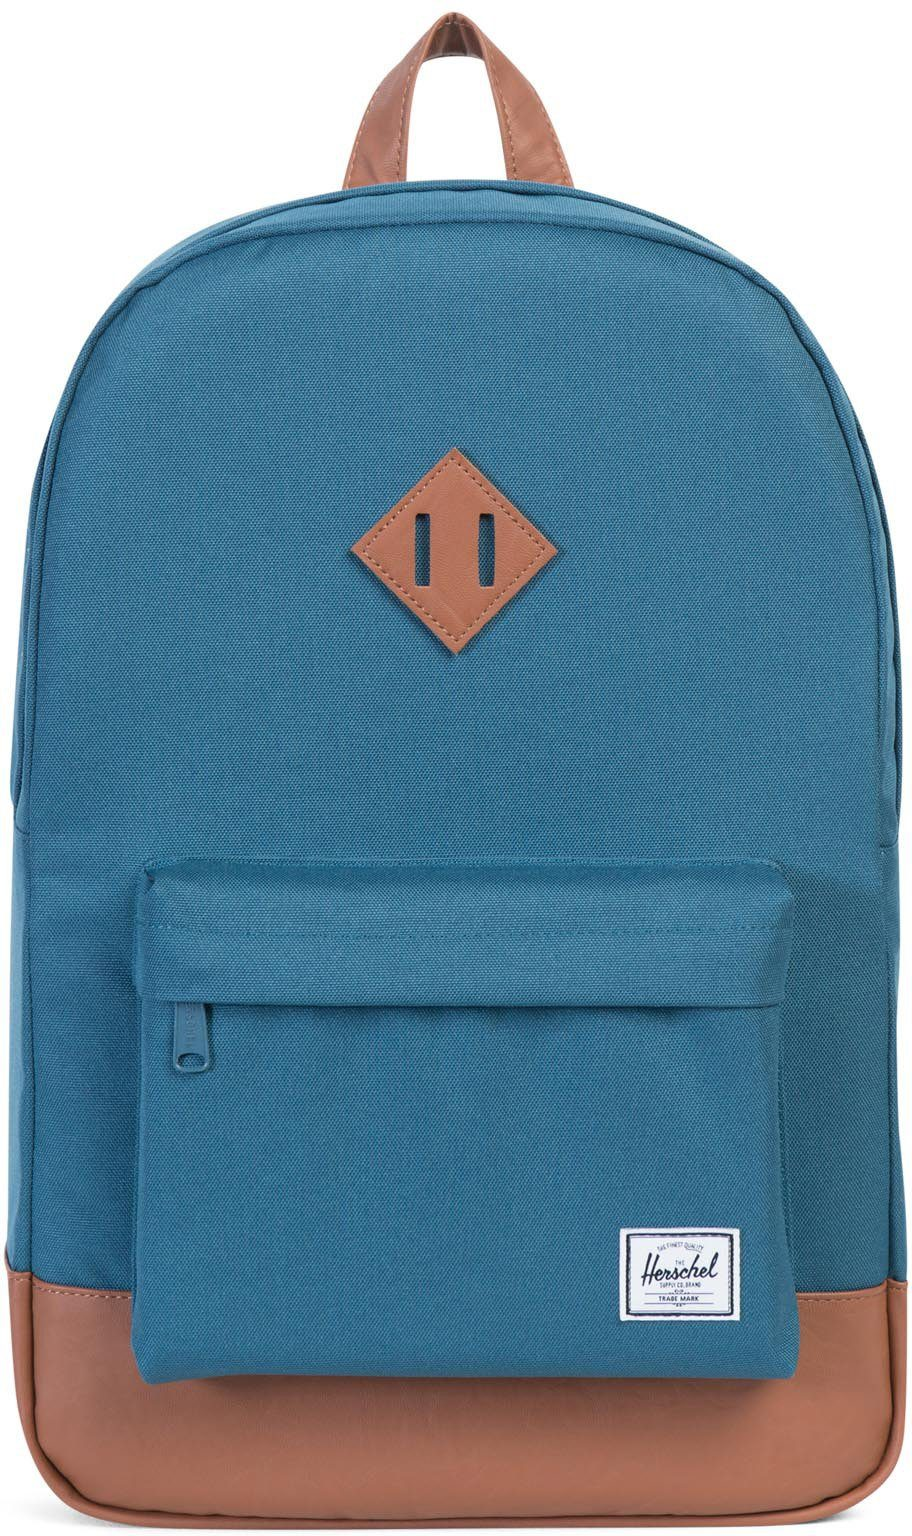 Herschel Rucksack mit Laptopfach, »Heritage Backpack, Indian Teal«